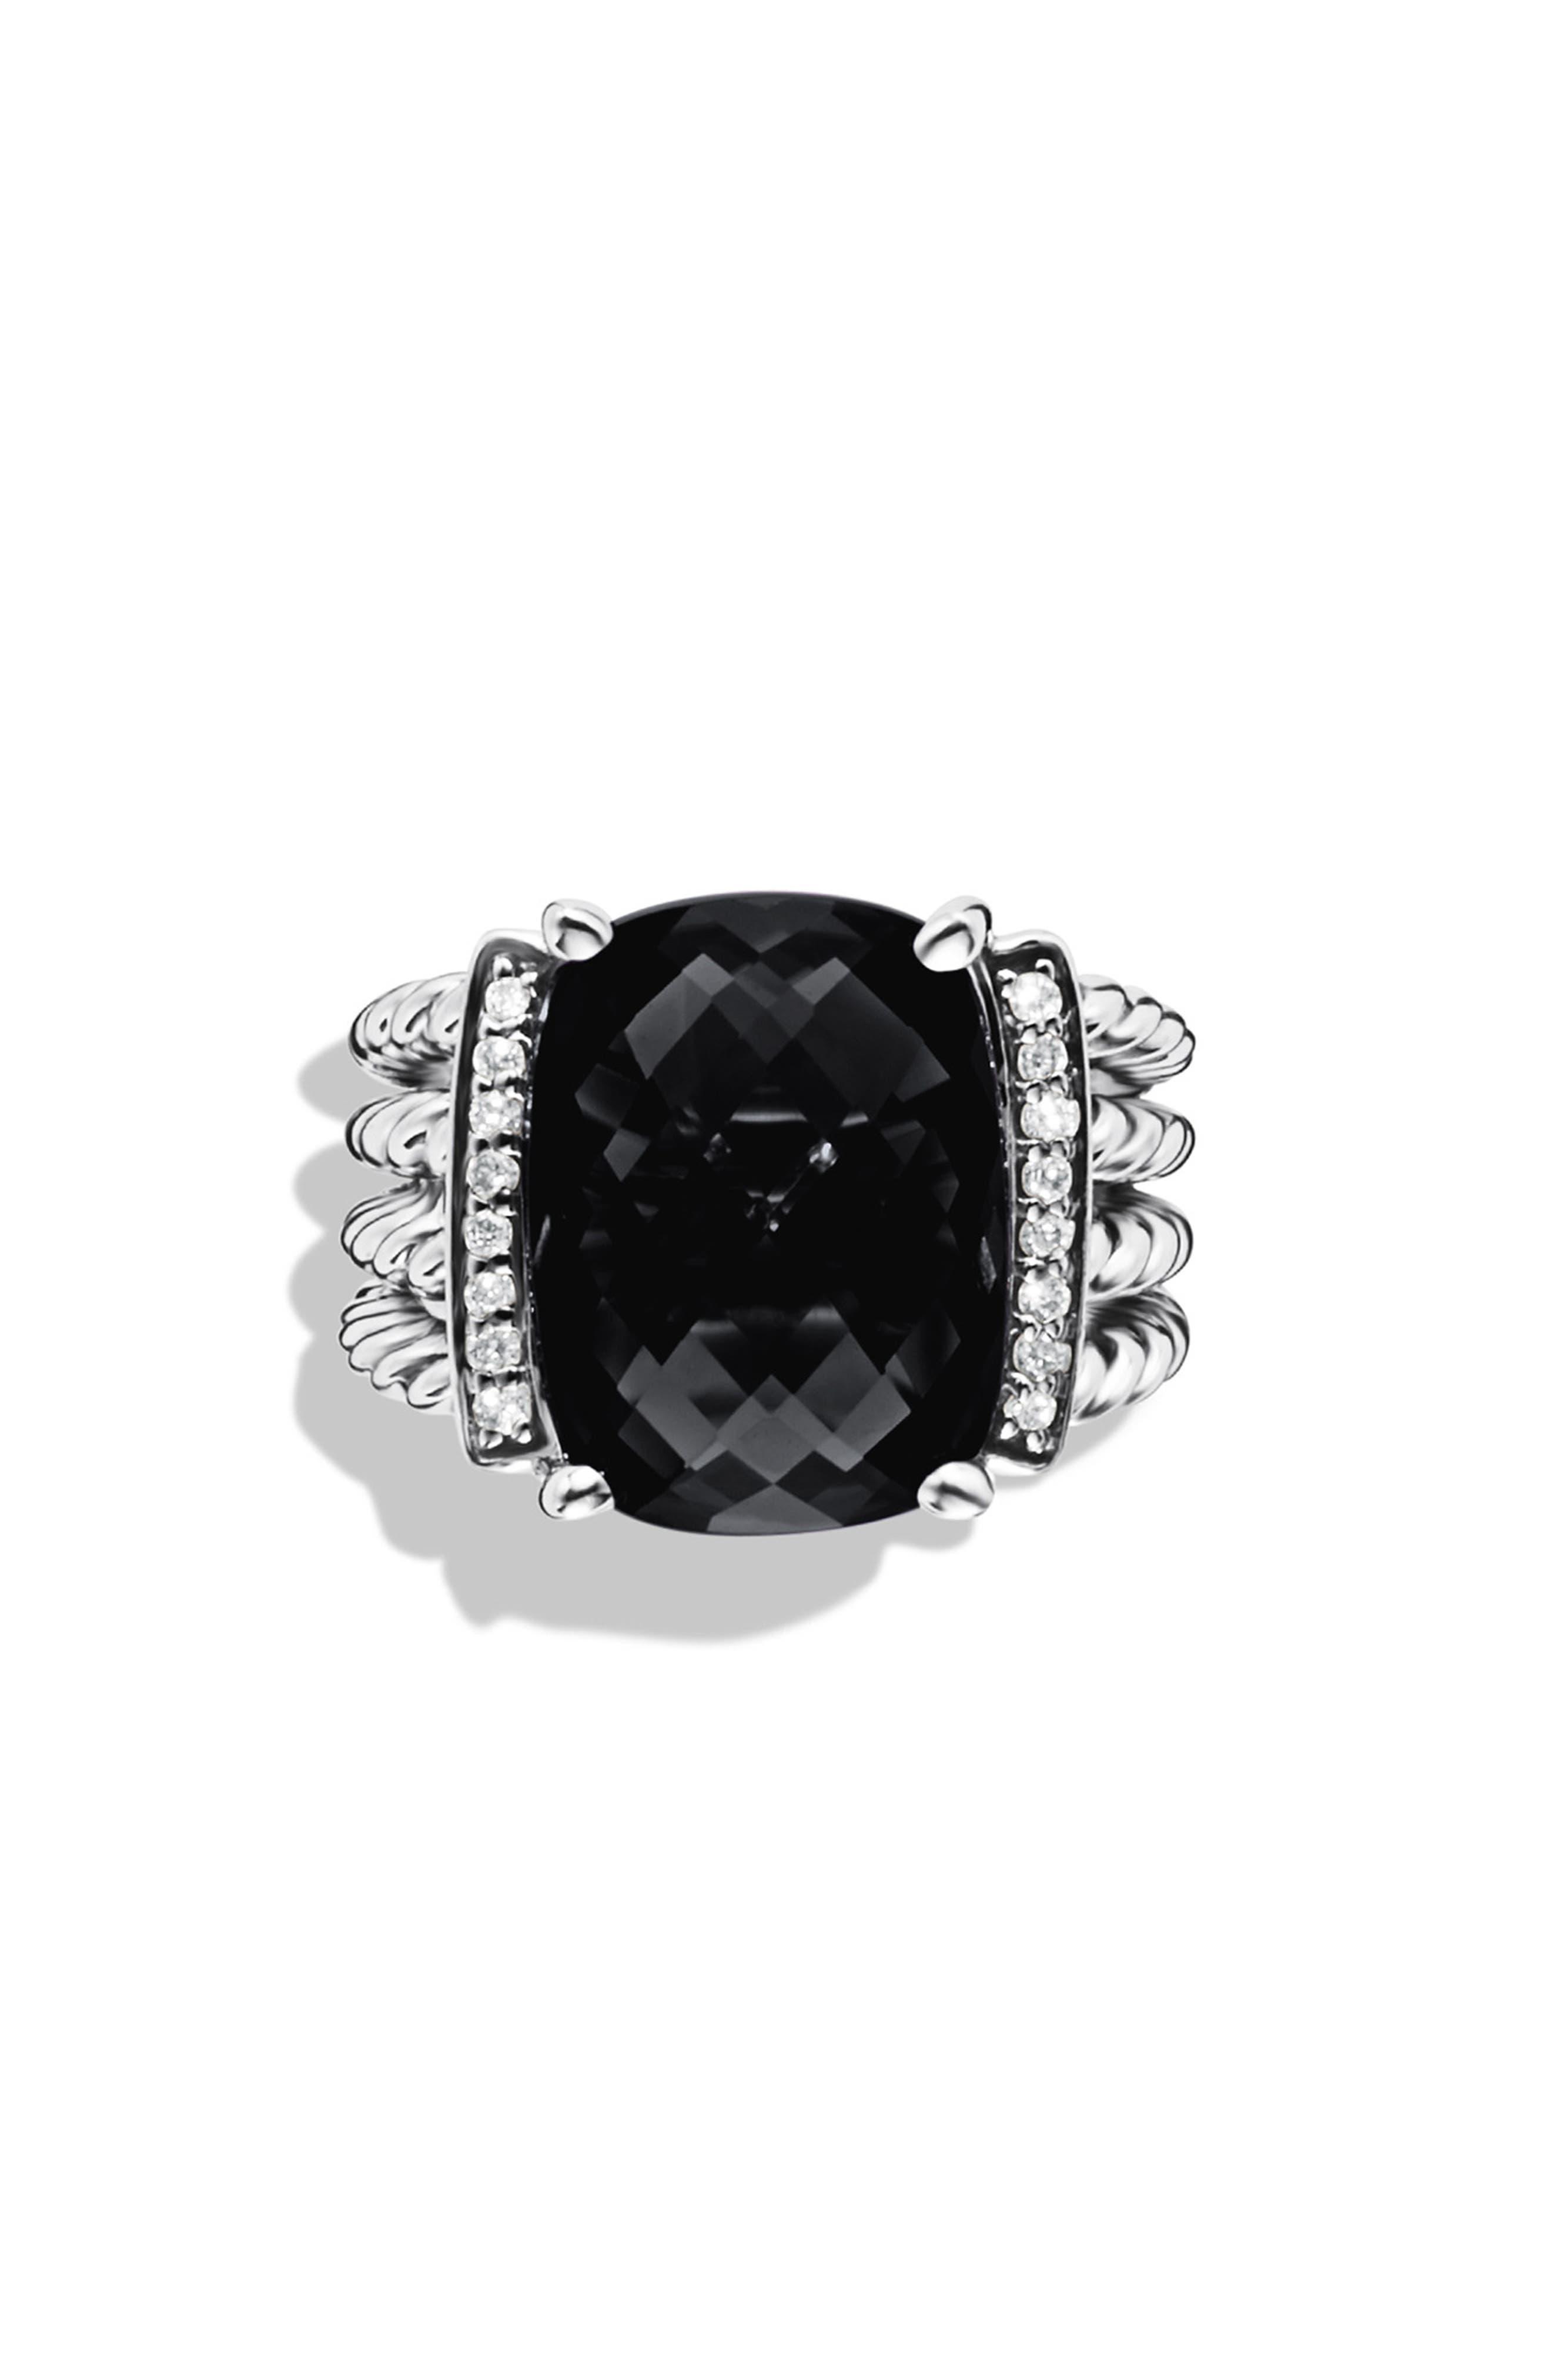 DAVID YURMAN 'Wheaton' Ring with Semiprecious Stone & Diamonds, Main, color, BLACK ONYX